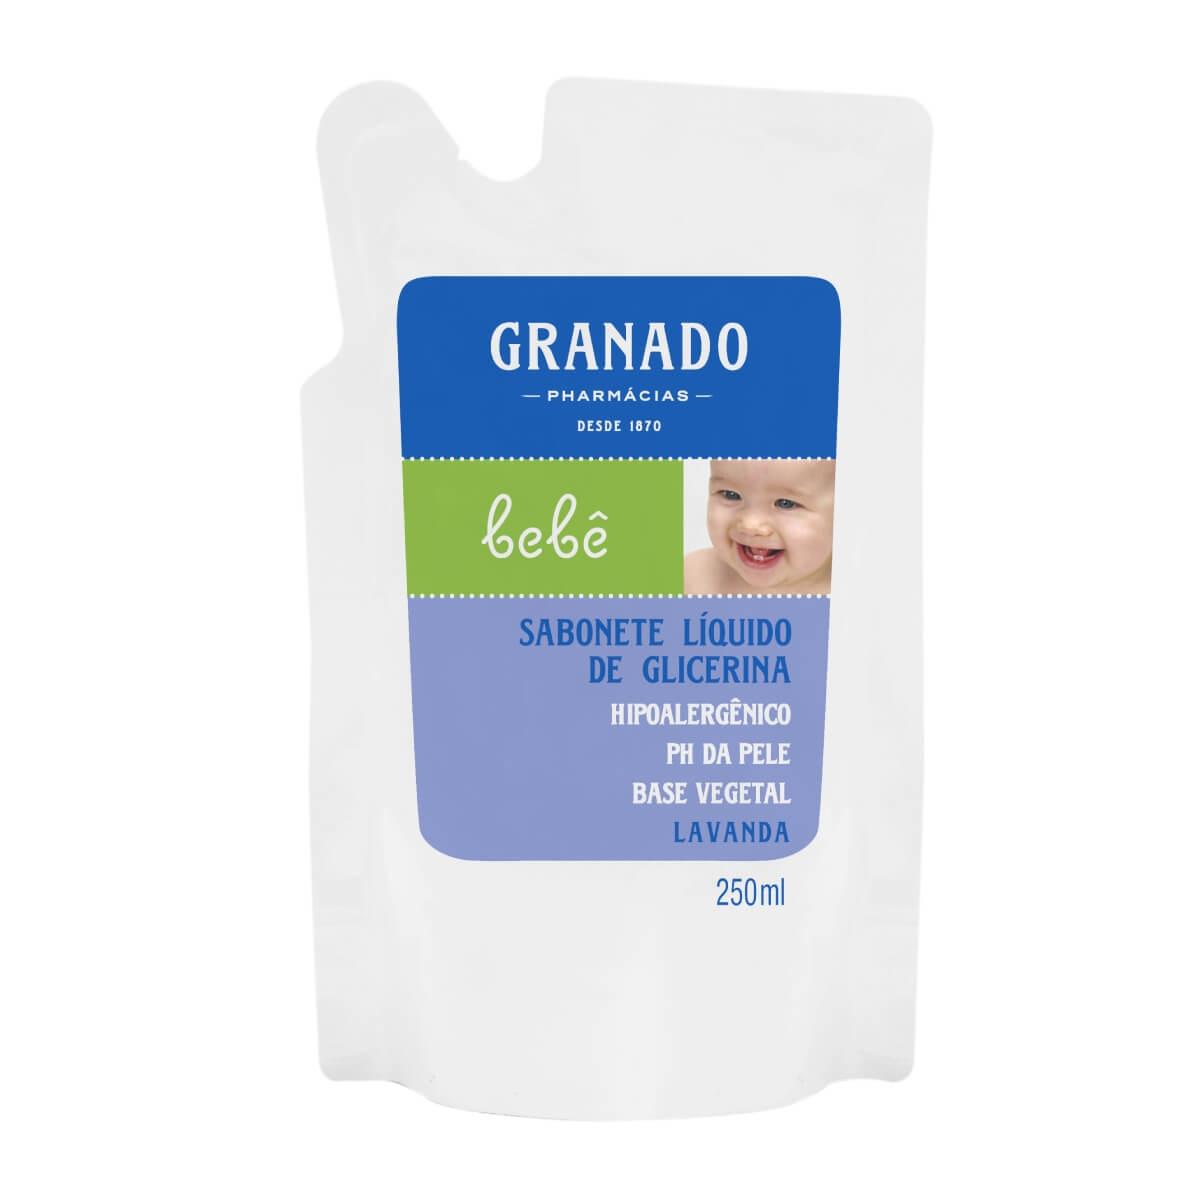 Refil Sabonete Líquido Granado Bebê Lavanda 250ml